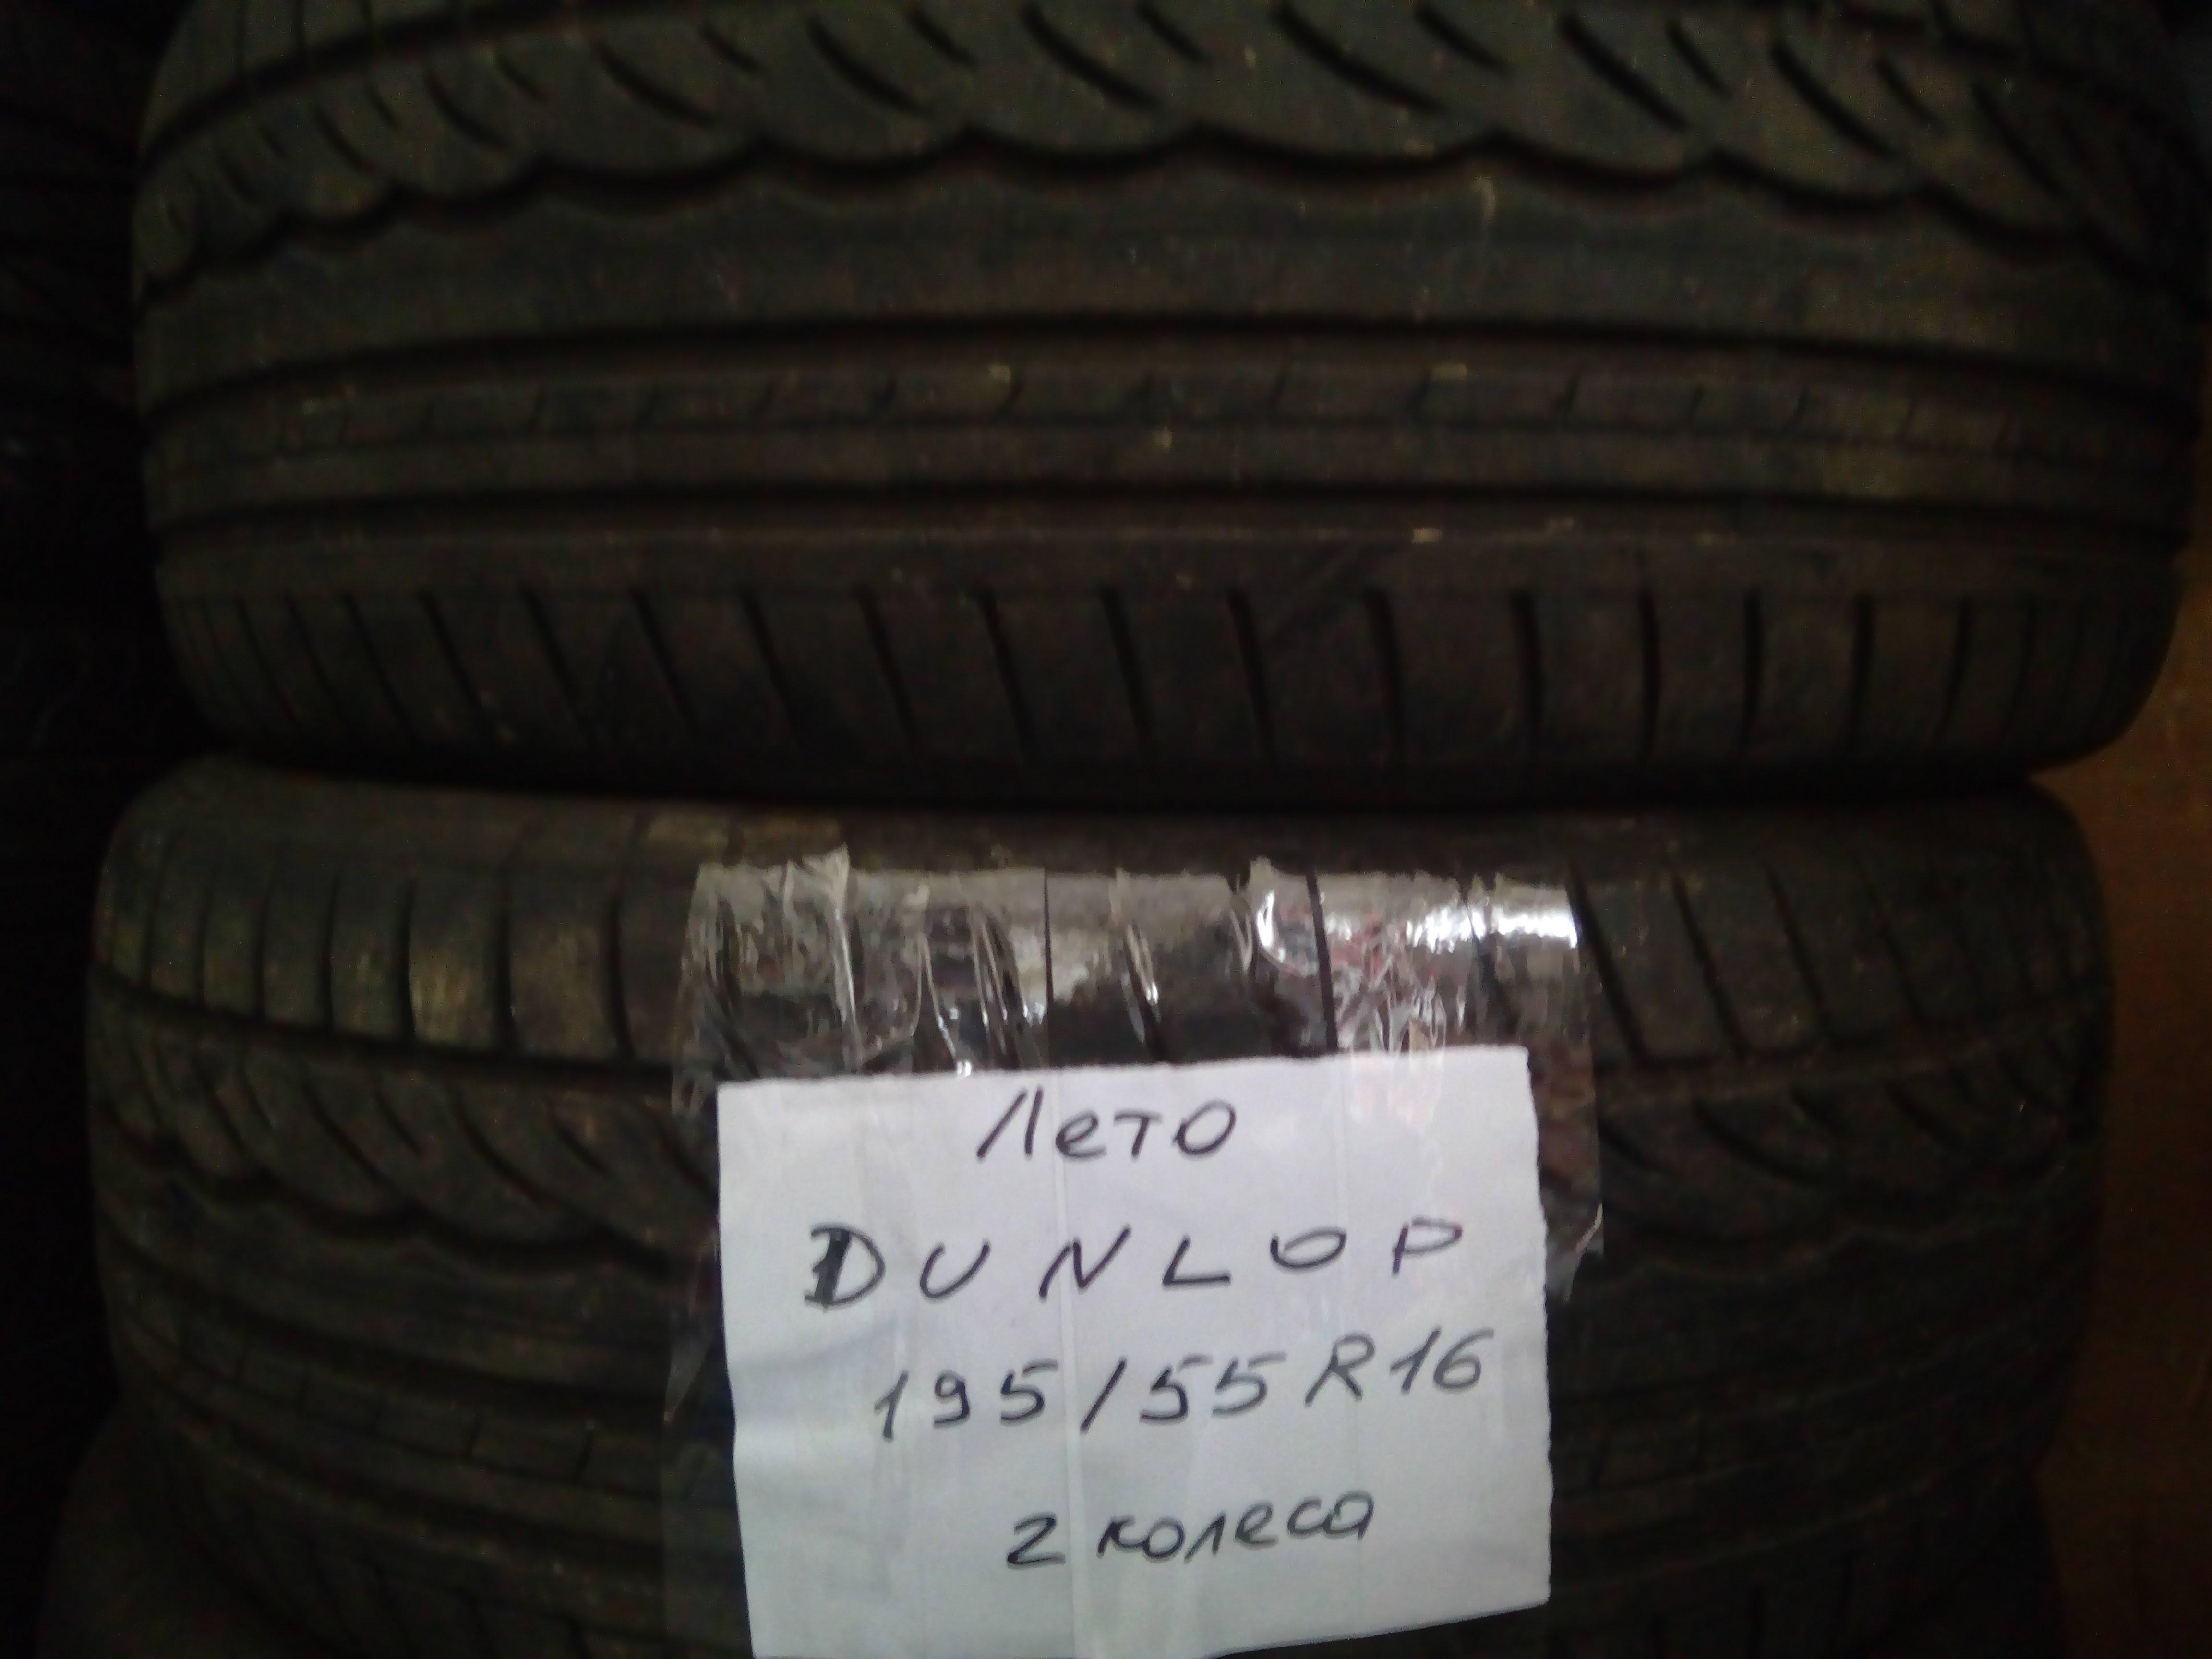 Dunlop 195/55 r16 2 шт лето Киев продажа бу